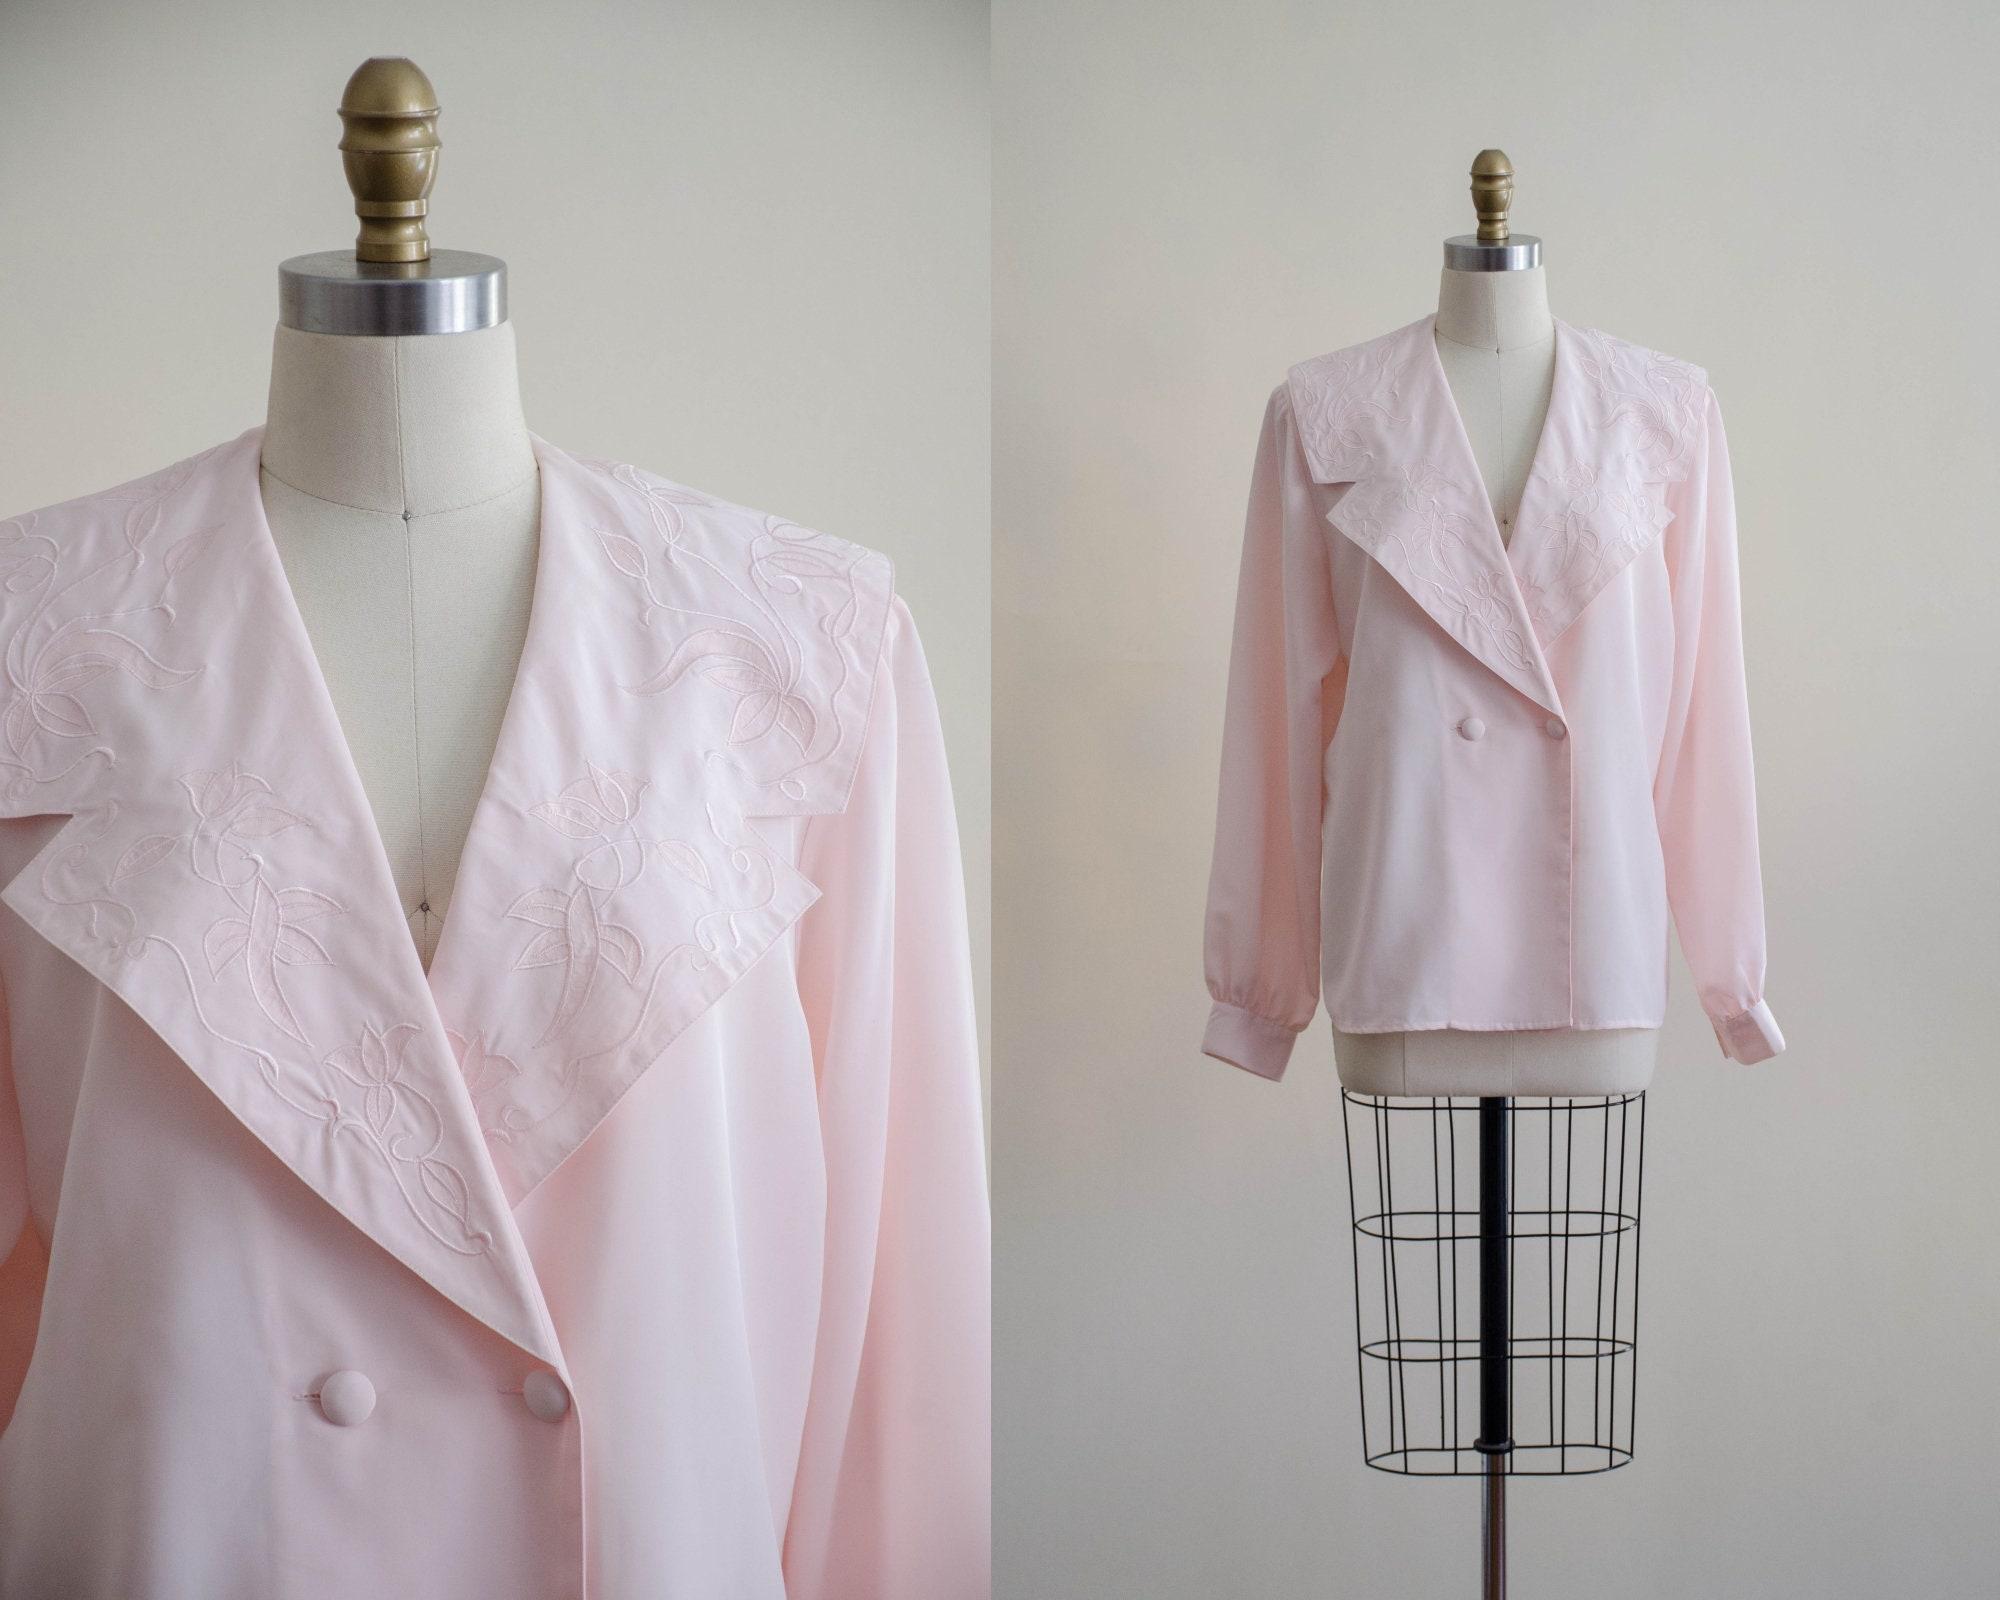 80s Tops, Shirts, T-shirts, Blouse   90s T-shirts 80S Pink Embroidered Sailor Collar Blouse  Blush Romantic Cottagecore Vintage Shirt $44.00 AT vintagedancer.com